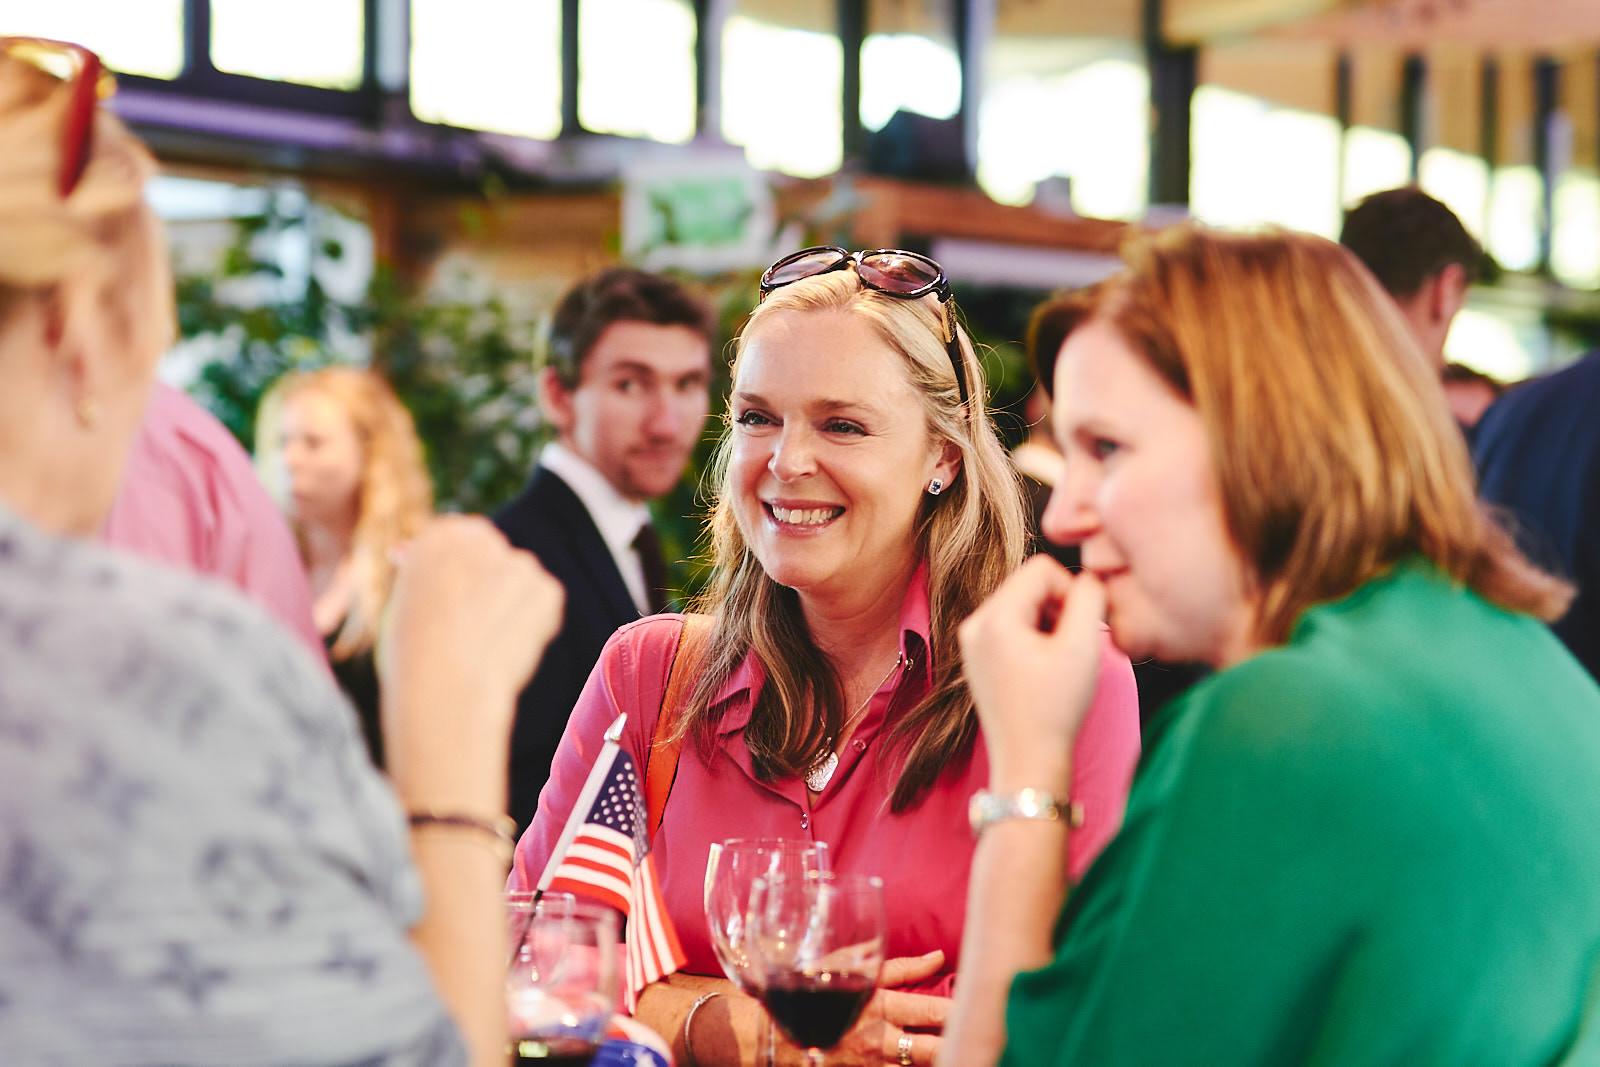 US consulate Edinburgh 4th of July celebration 2018 - 186 web.jpg